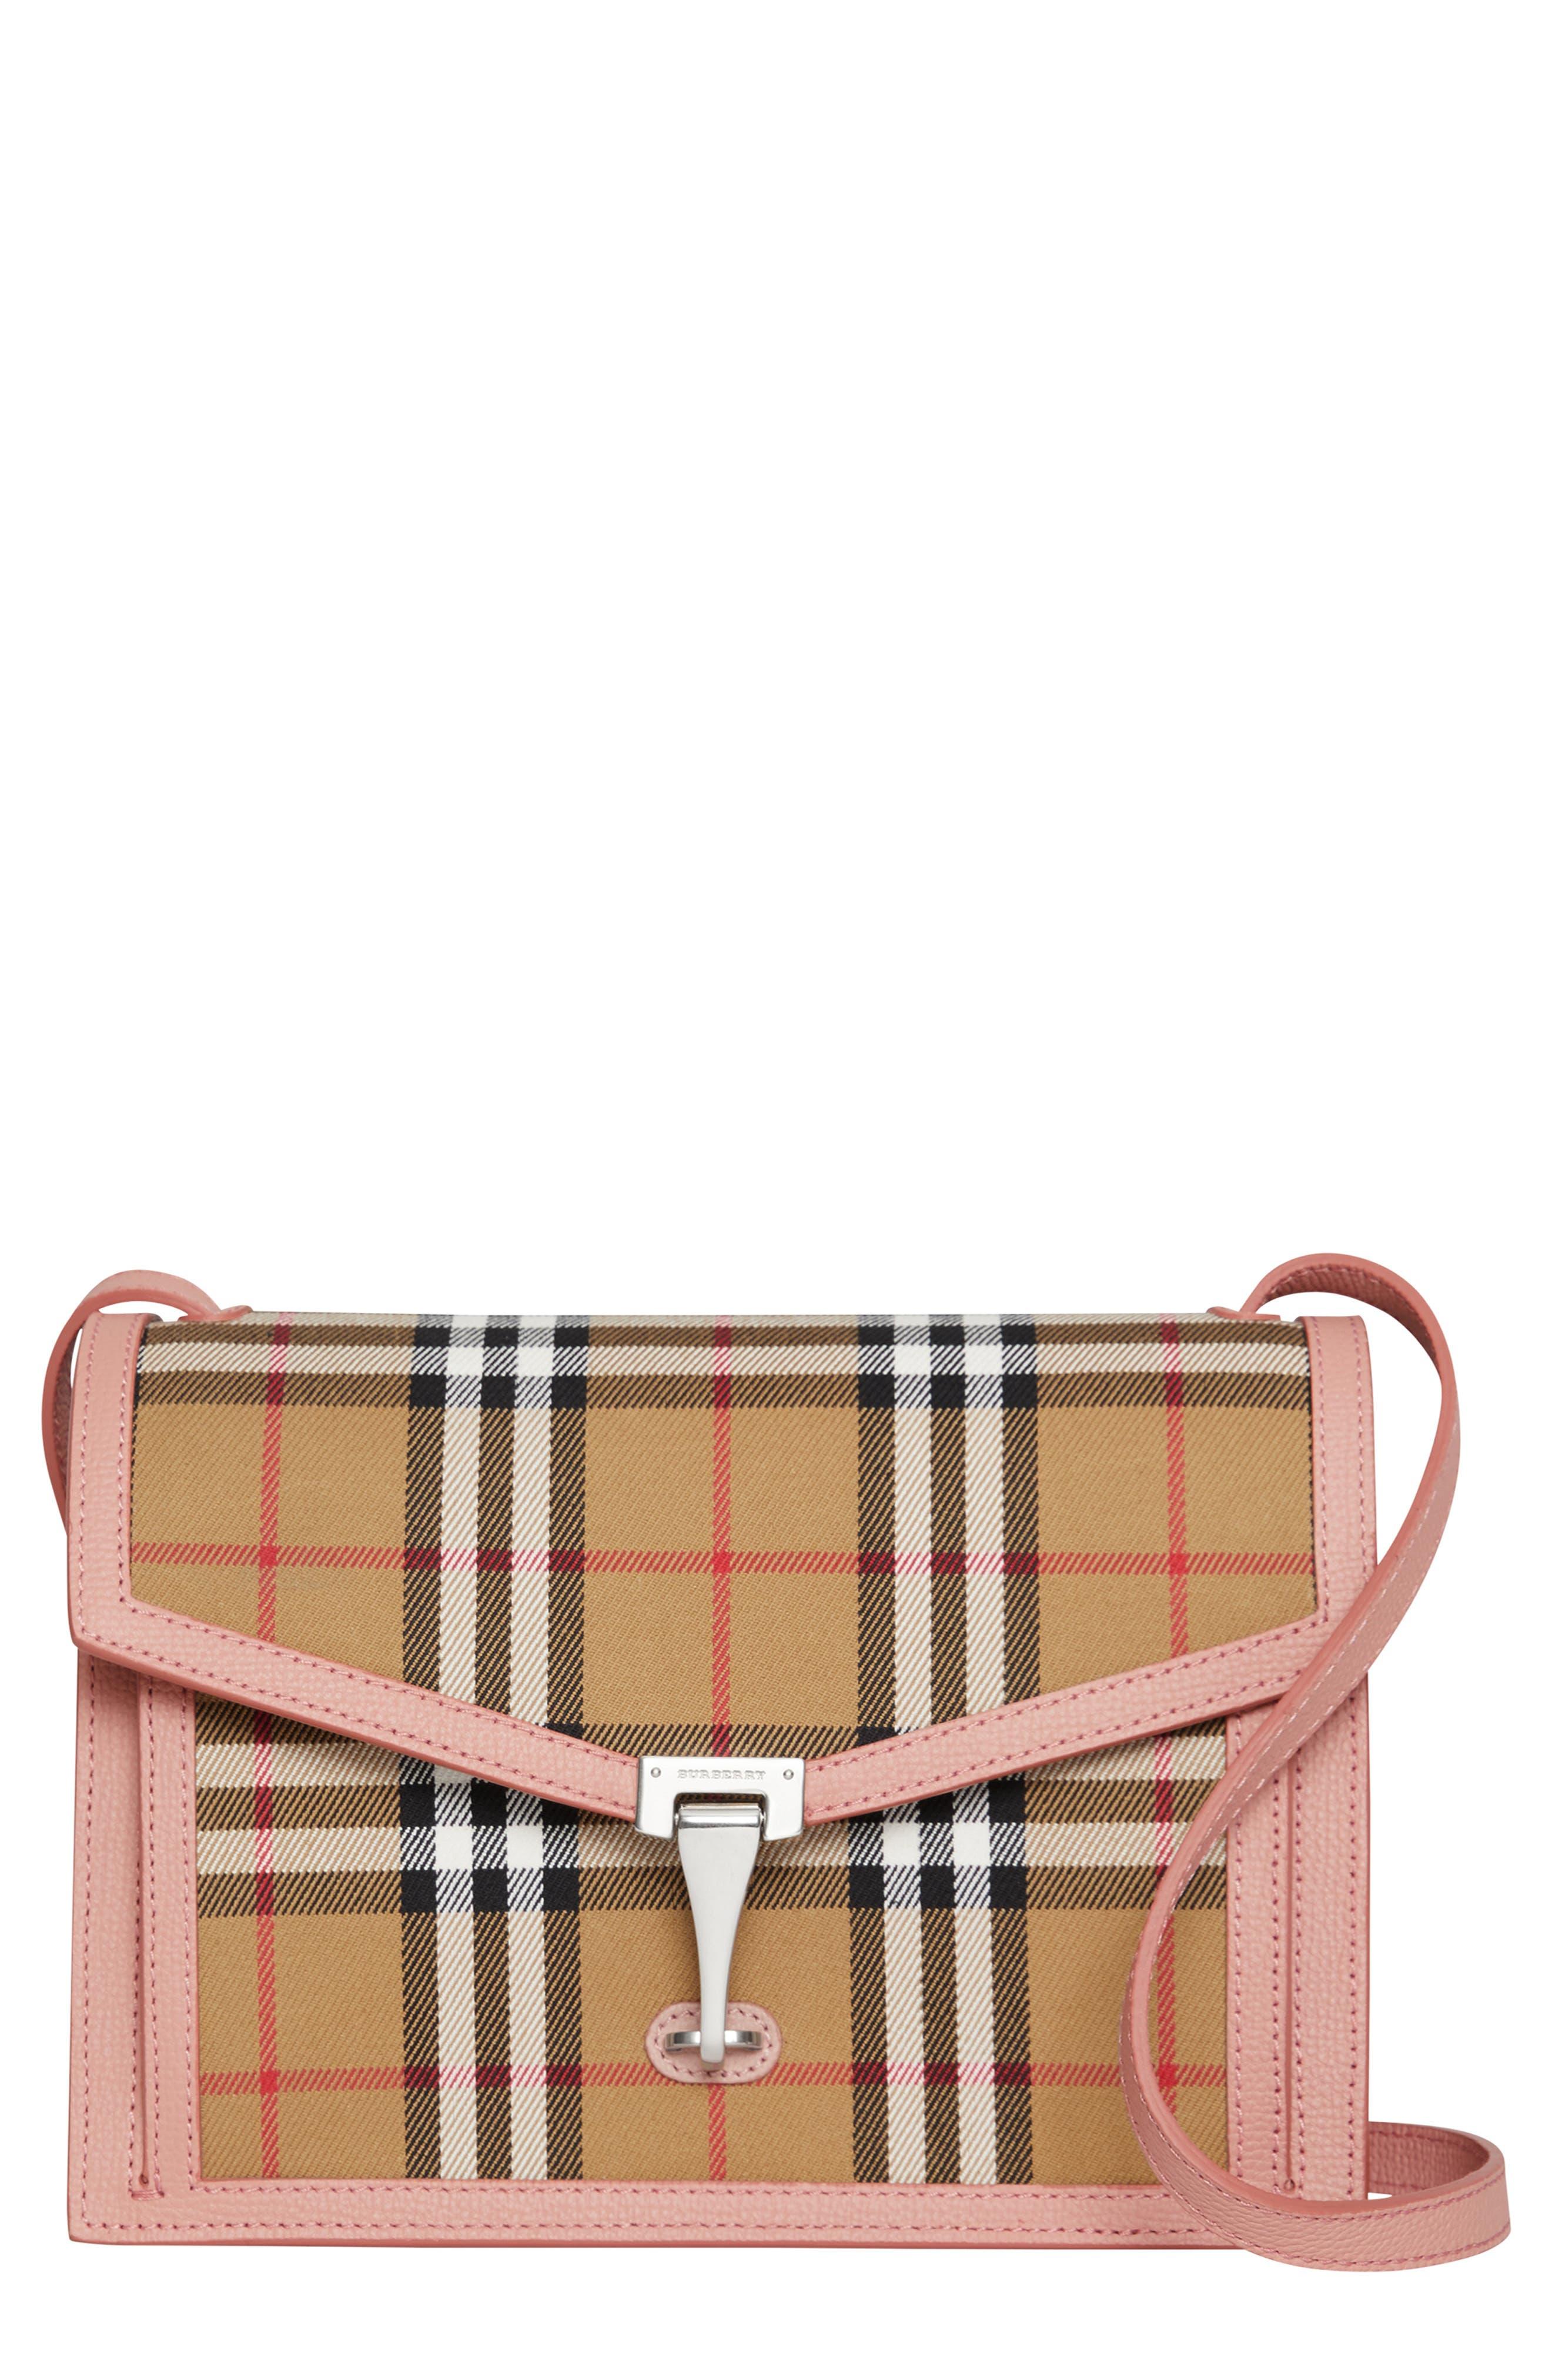 5ac84df22de1 Burberry Small Macken Vintage Check Crossbody Bag - Pink